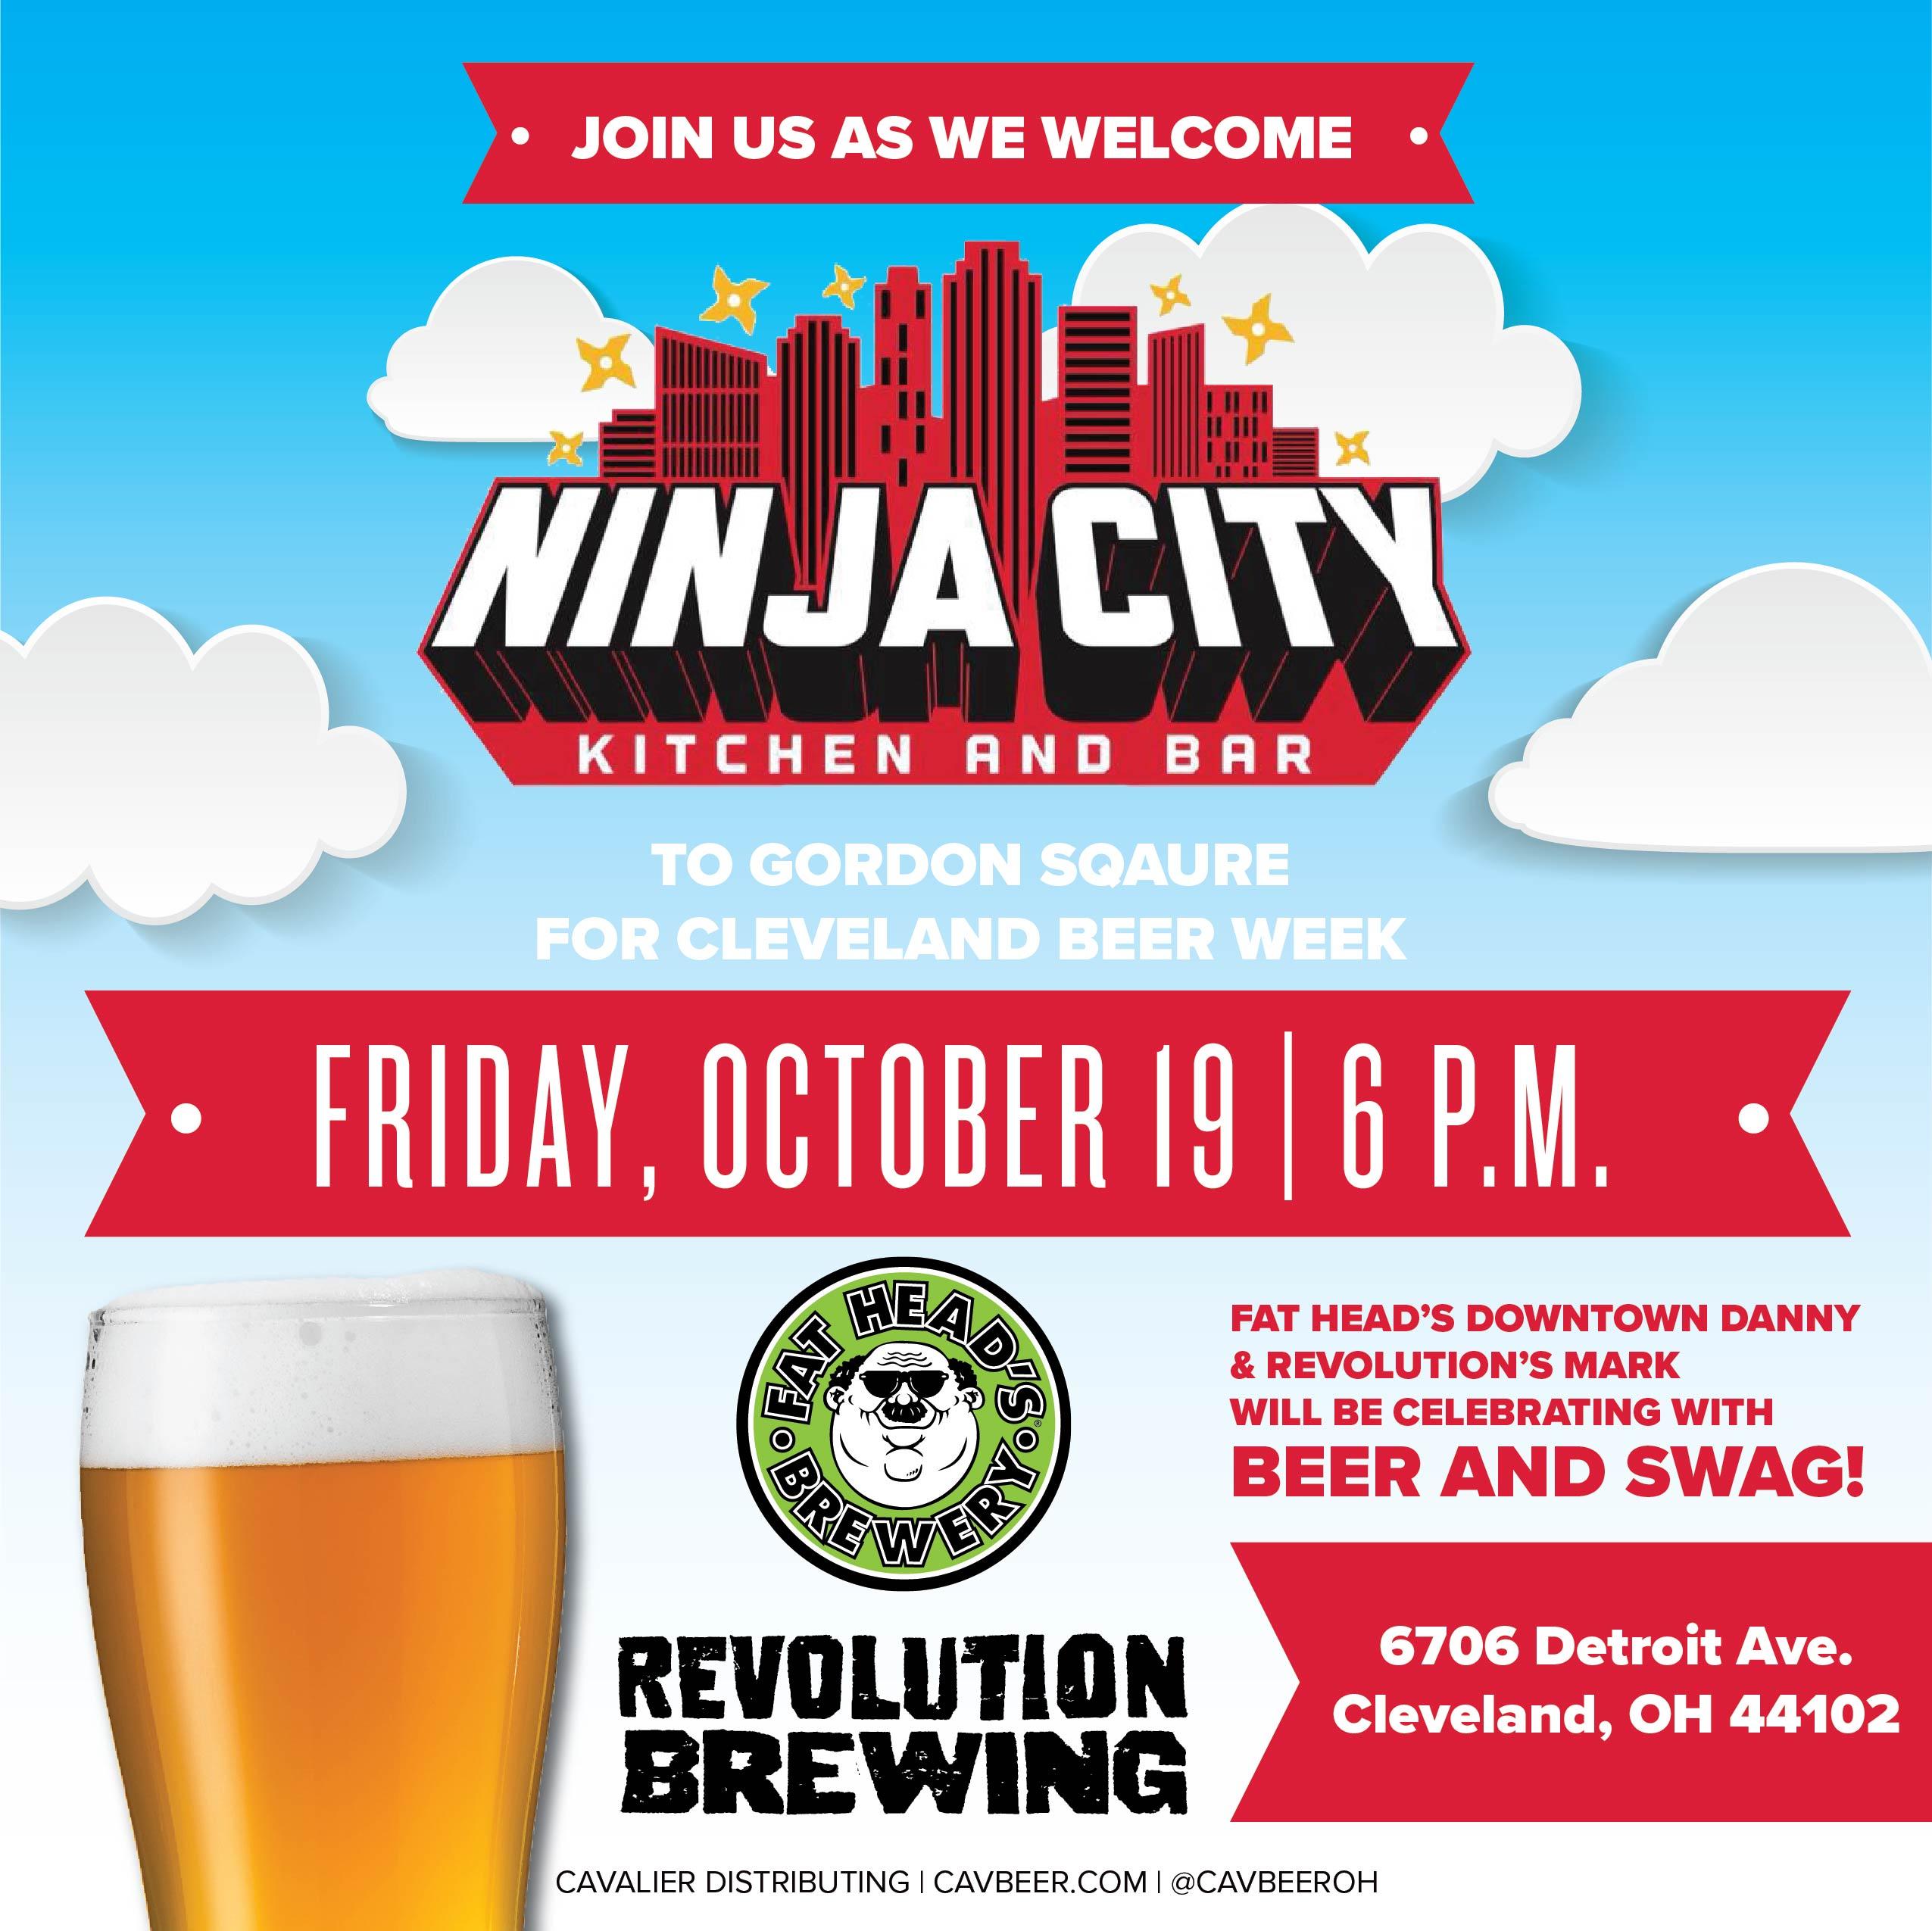 Cleveland Beer Week Fat Head S And Revolution At Ninja City